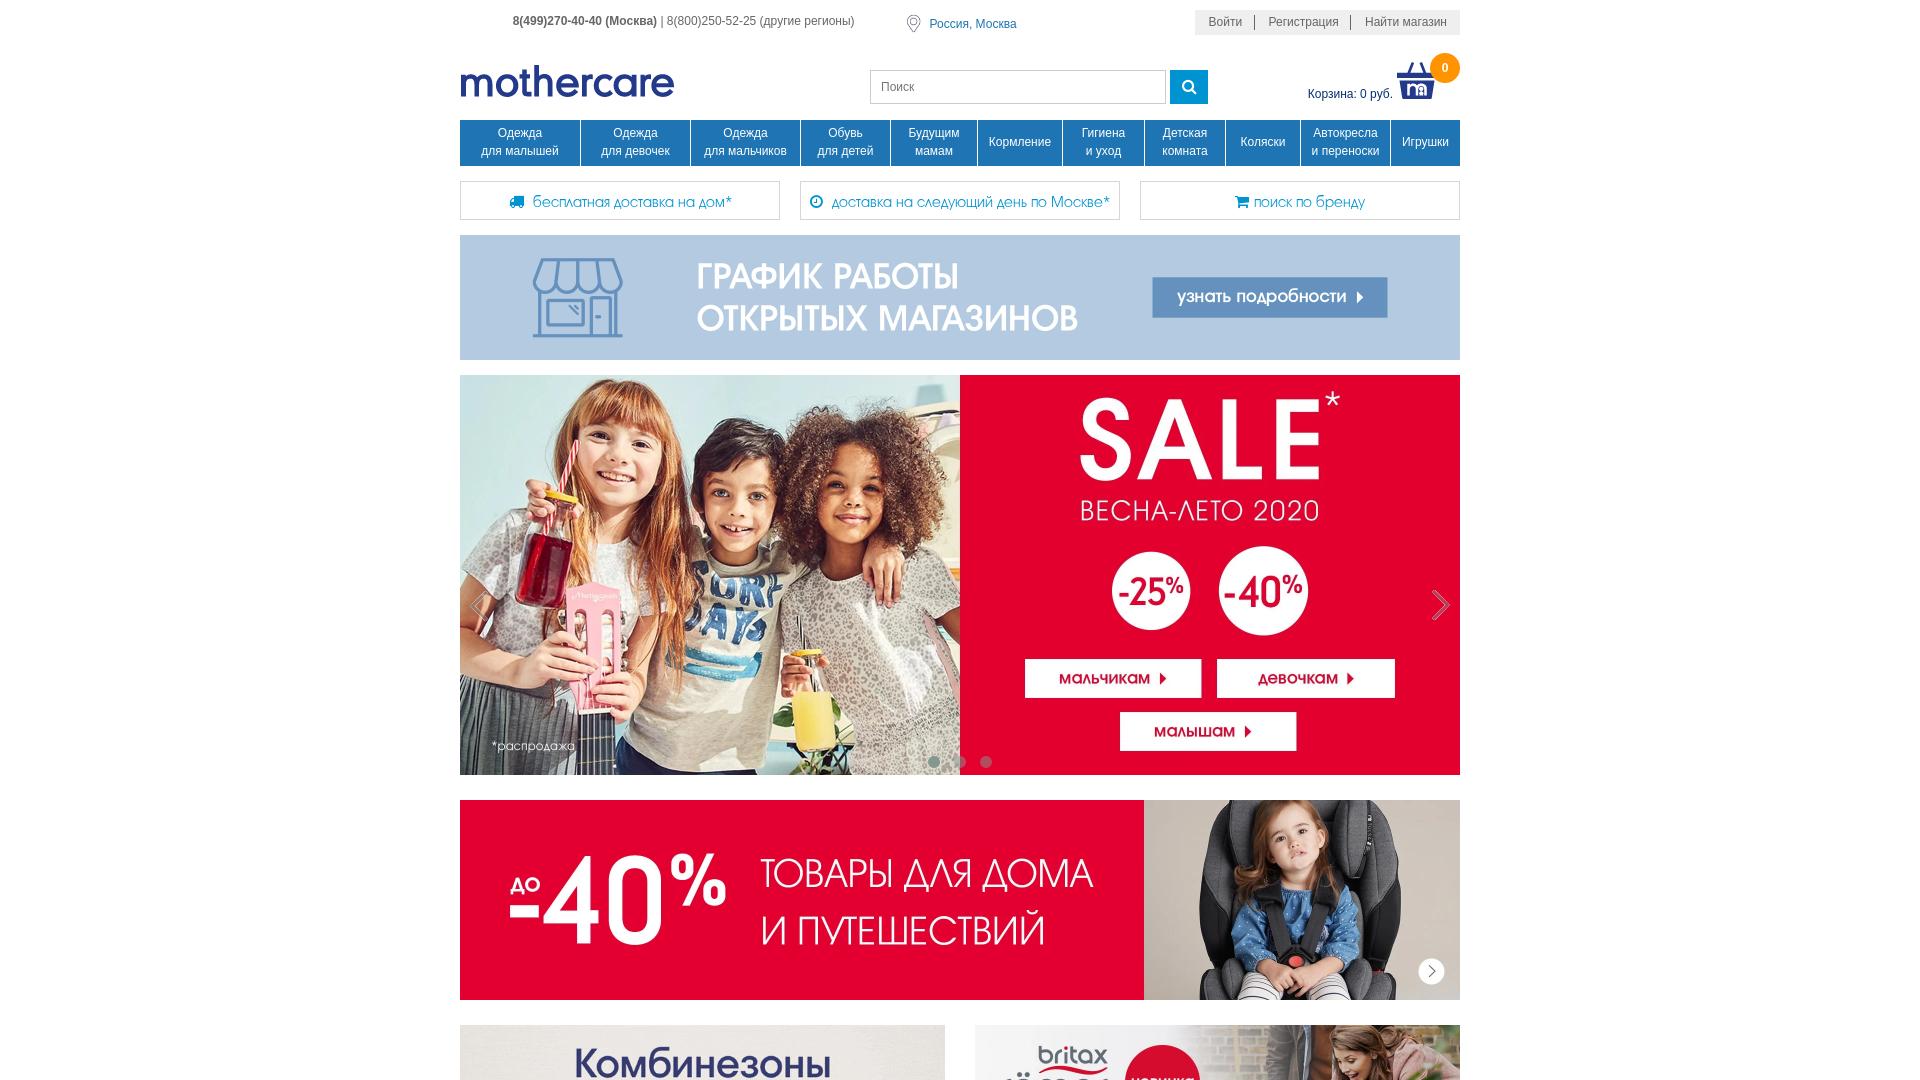 Mothercare RU website